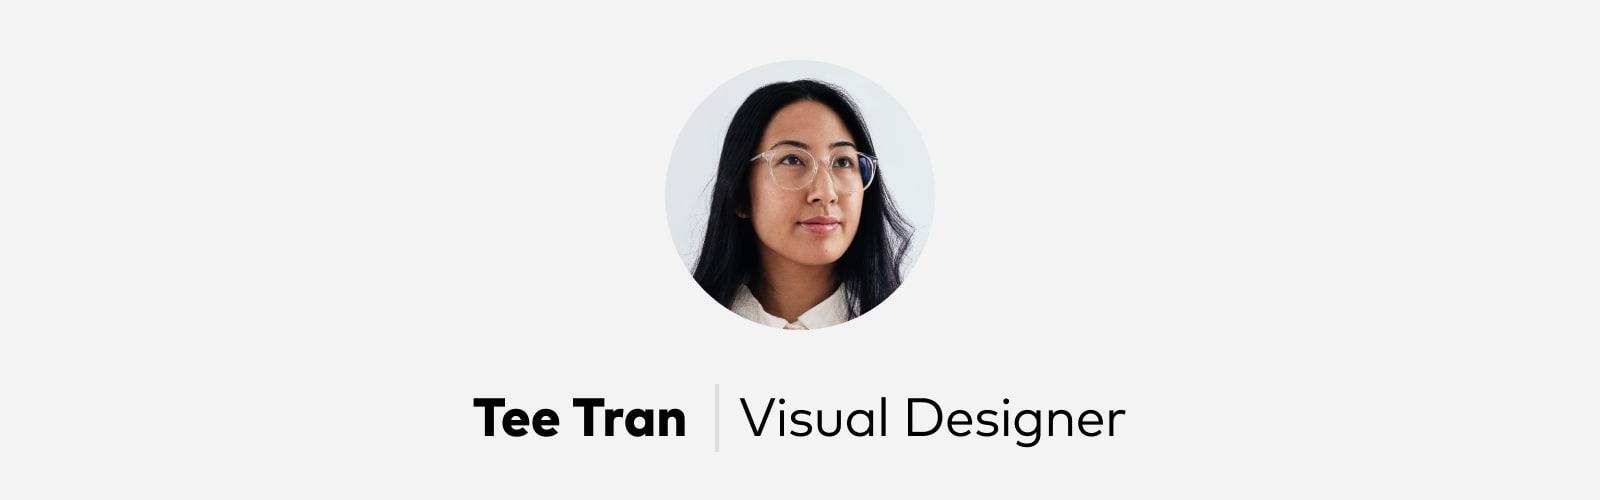 Tree Tran Visual Designer at Pitch